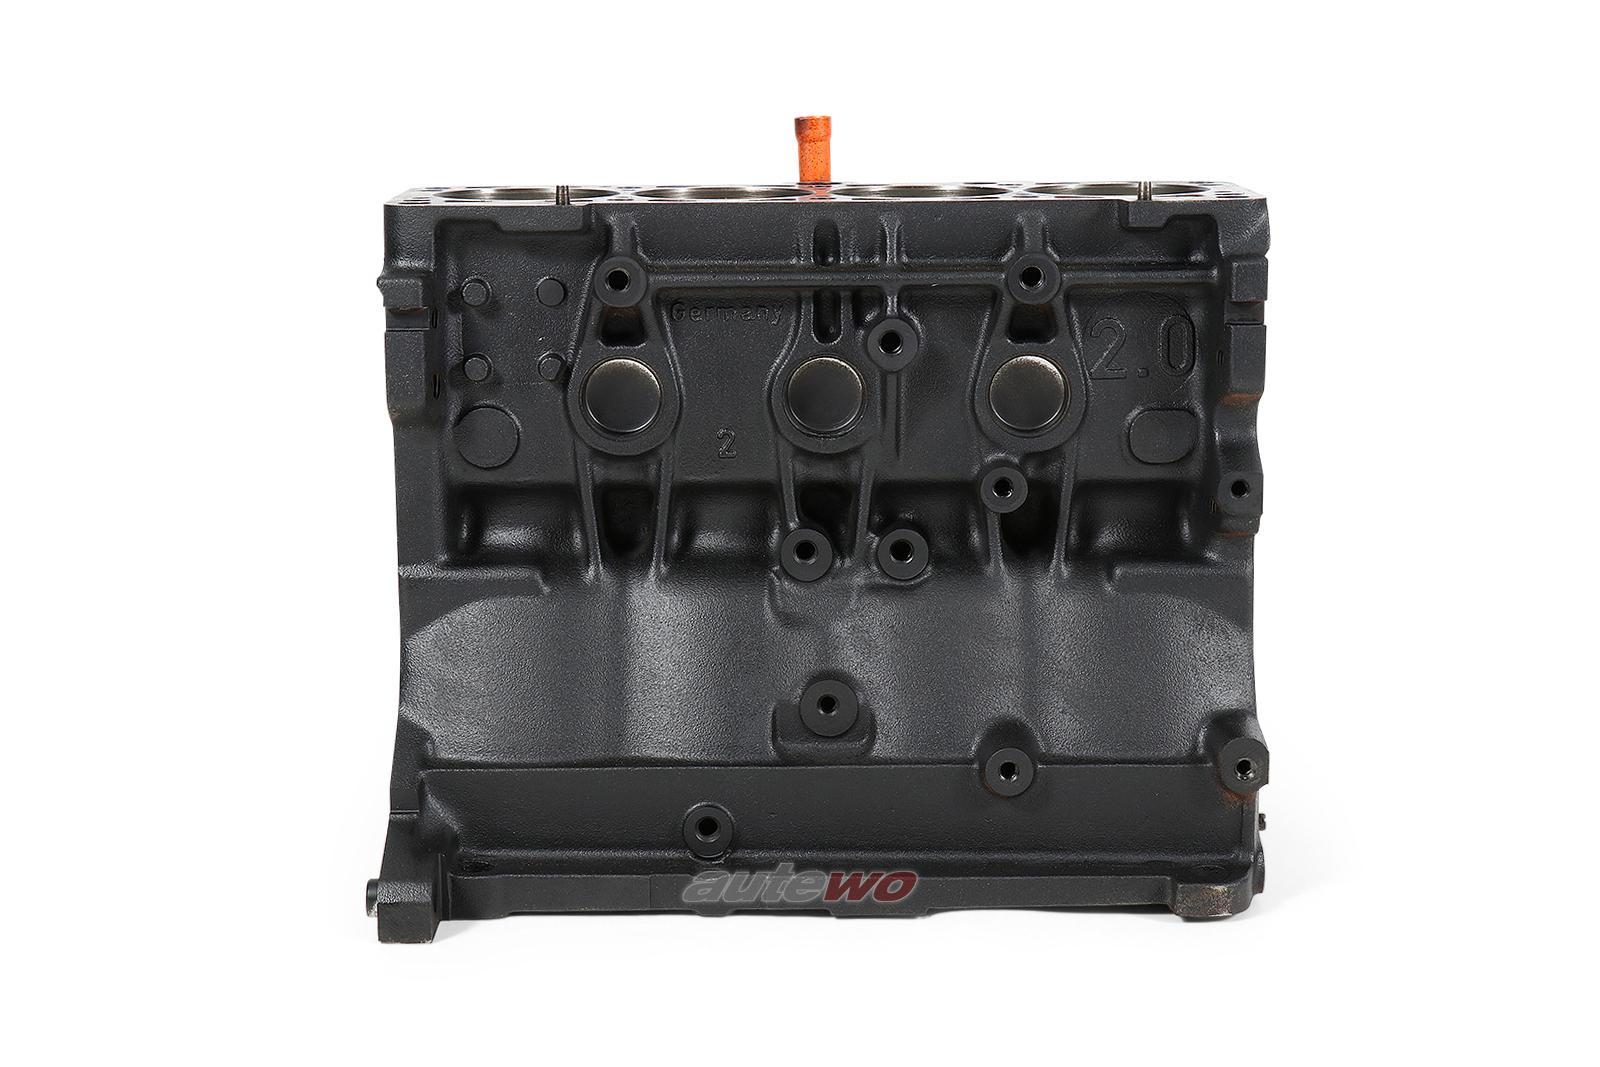 048703021D Audi 80 B4/Coupe/Cabrio Typ 89/100/A6 C4 2.0l ABK 249176 Motorblock